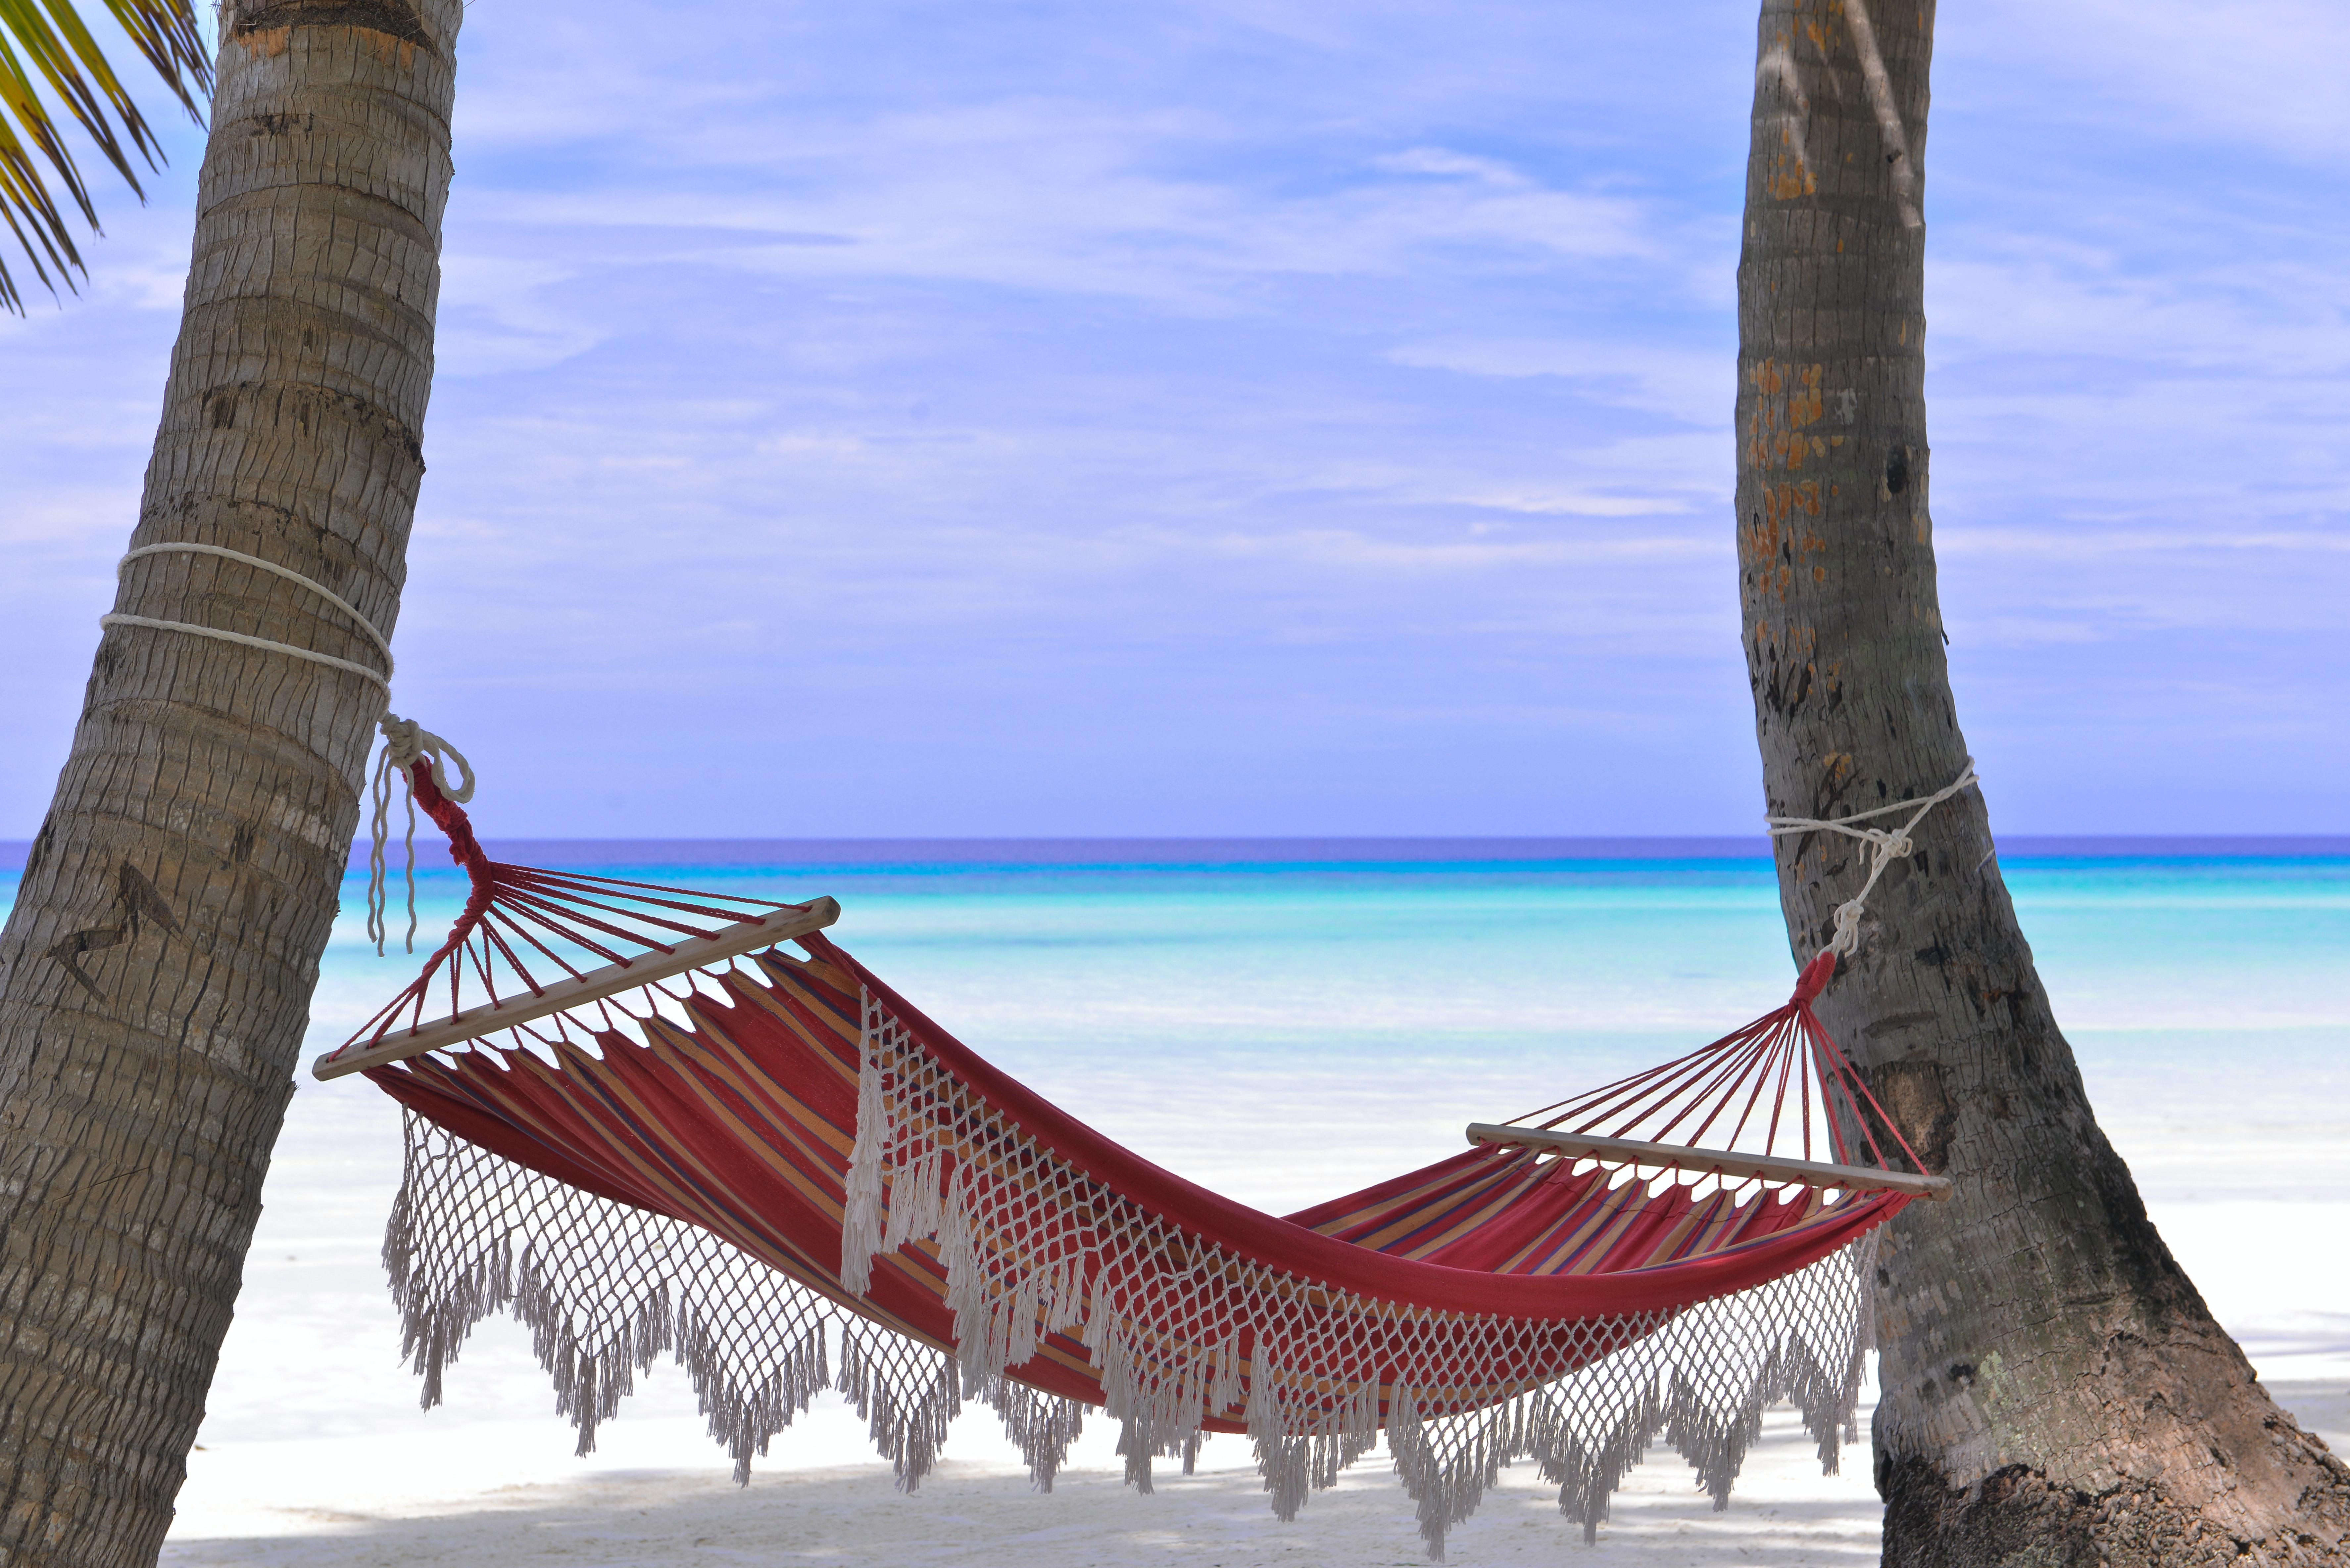 Win a Tropical Getaway to the Montego Bay, Jamaica!